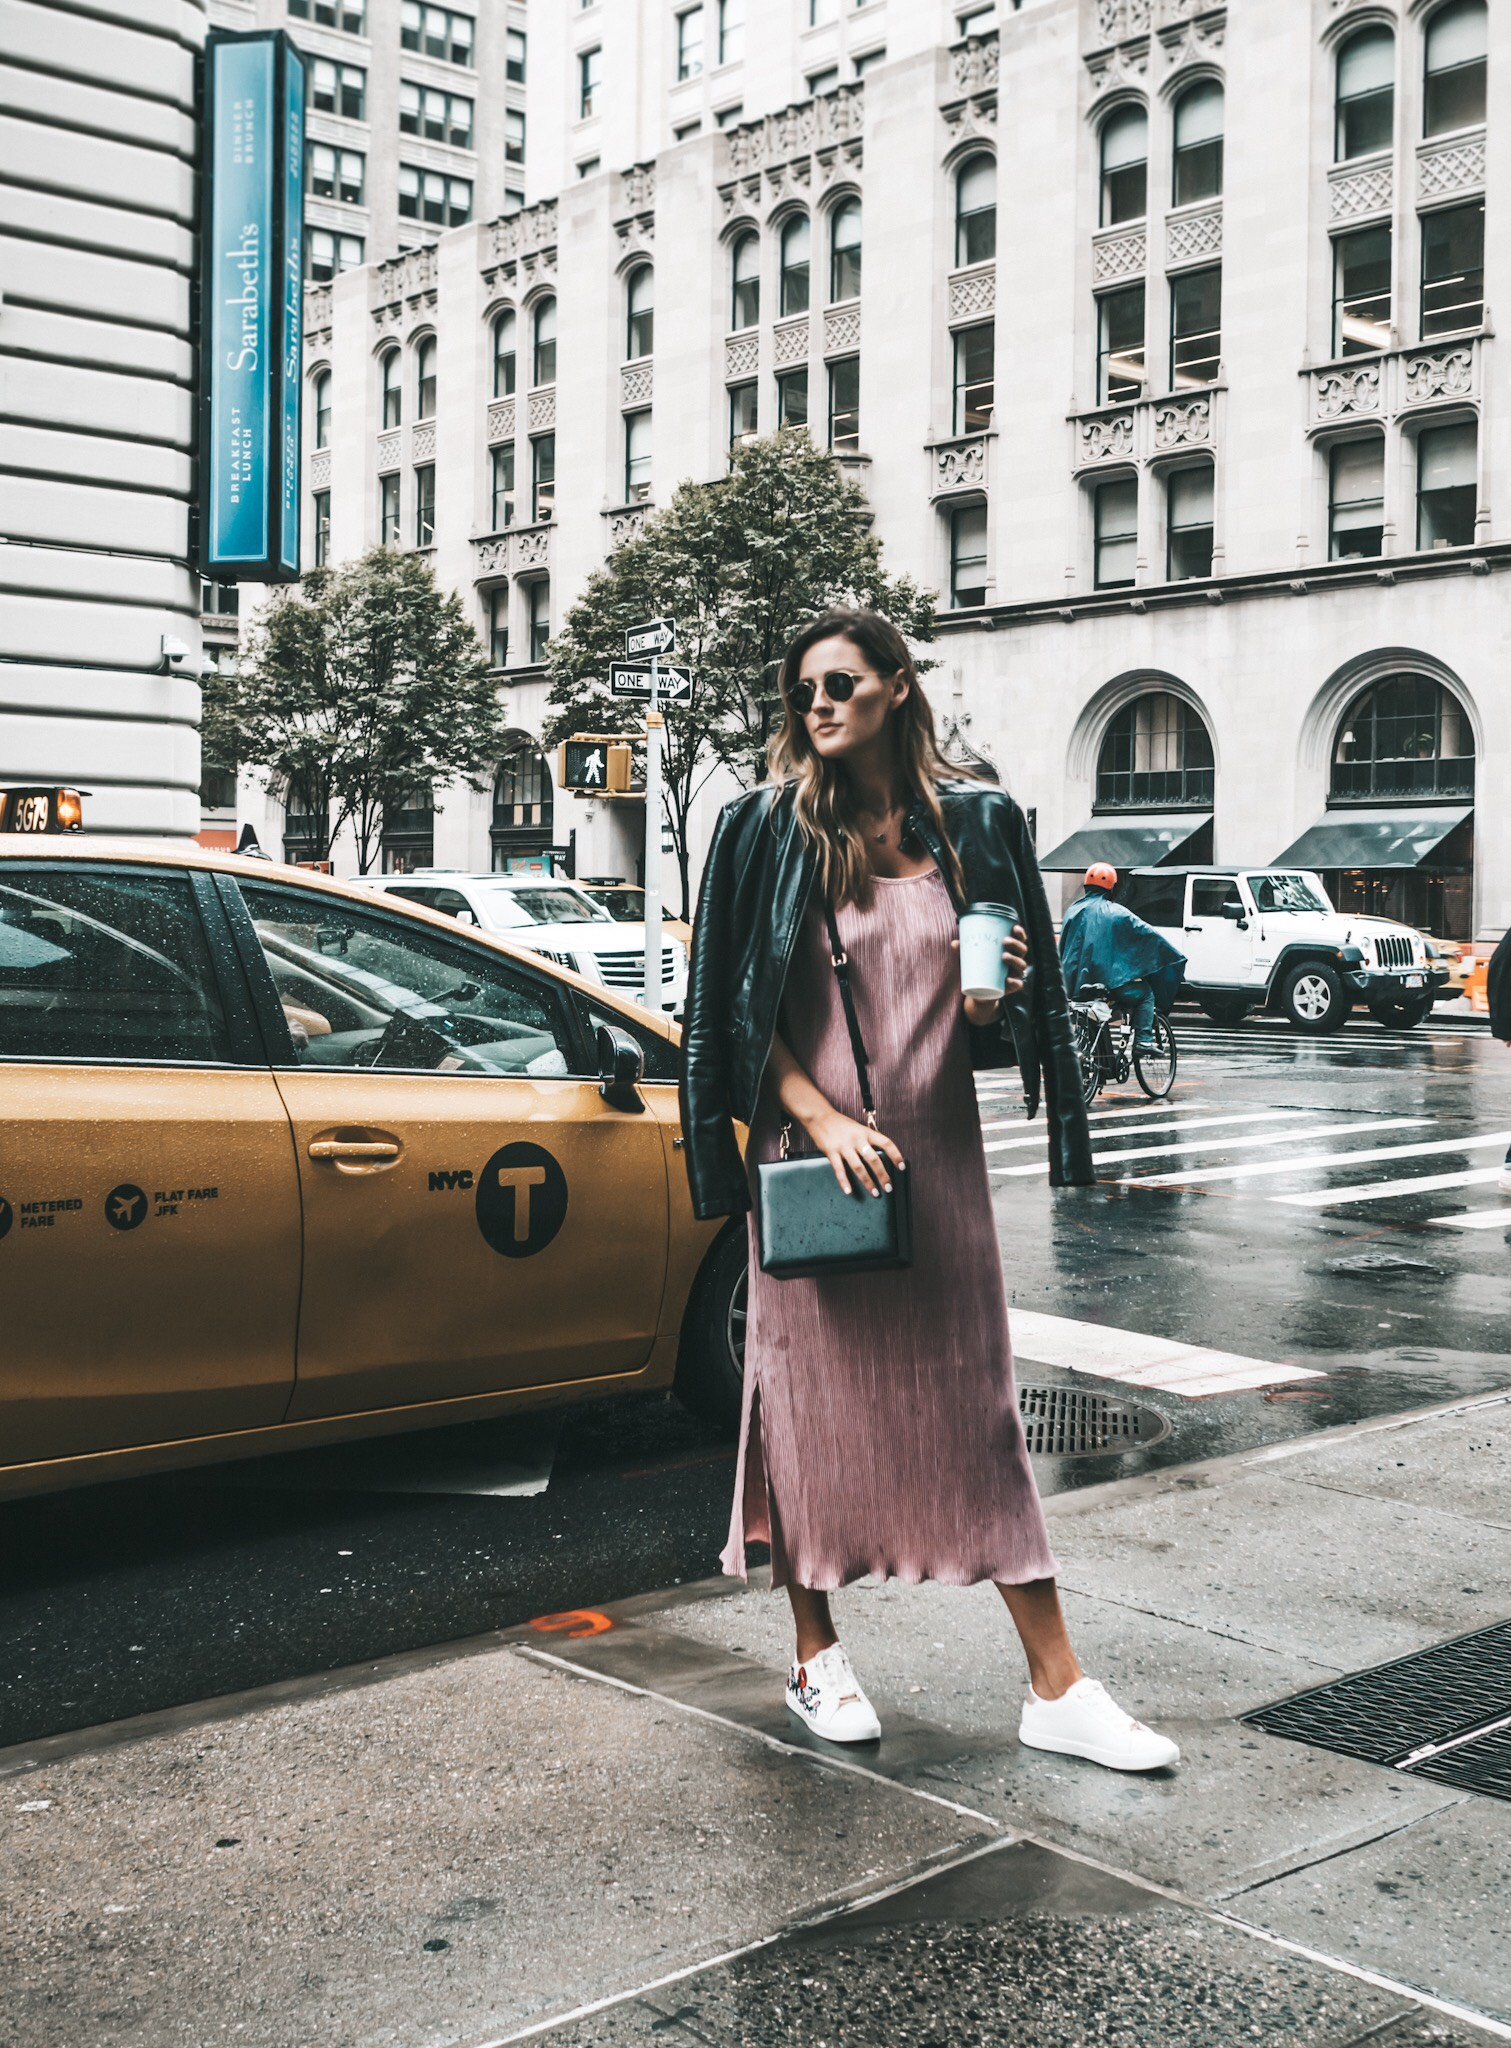 street style image.jpg